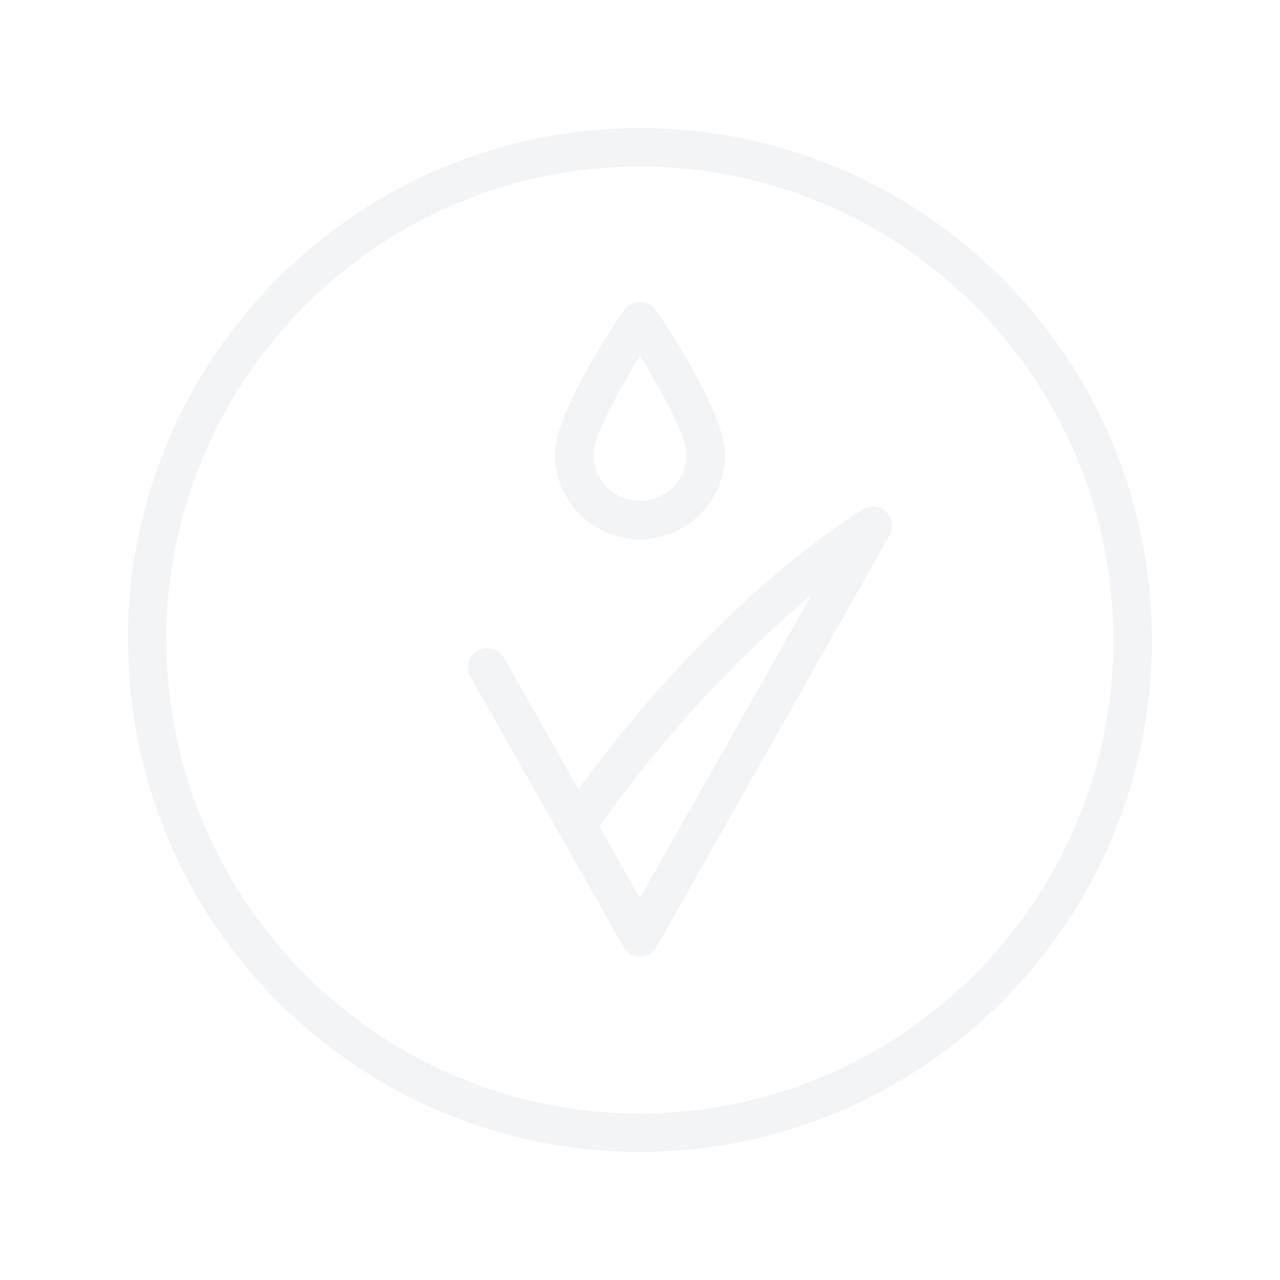 WELLA PROFESSIONALS EIMI Shape Me Hair Gel  стайлинг-гель для укладки волос150ml